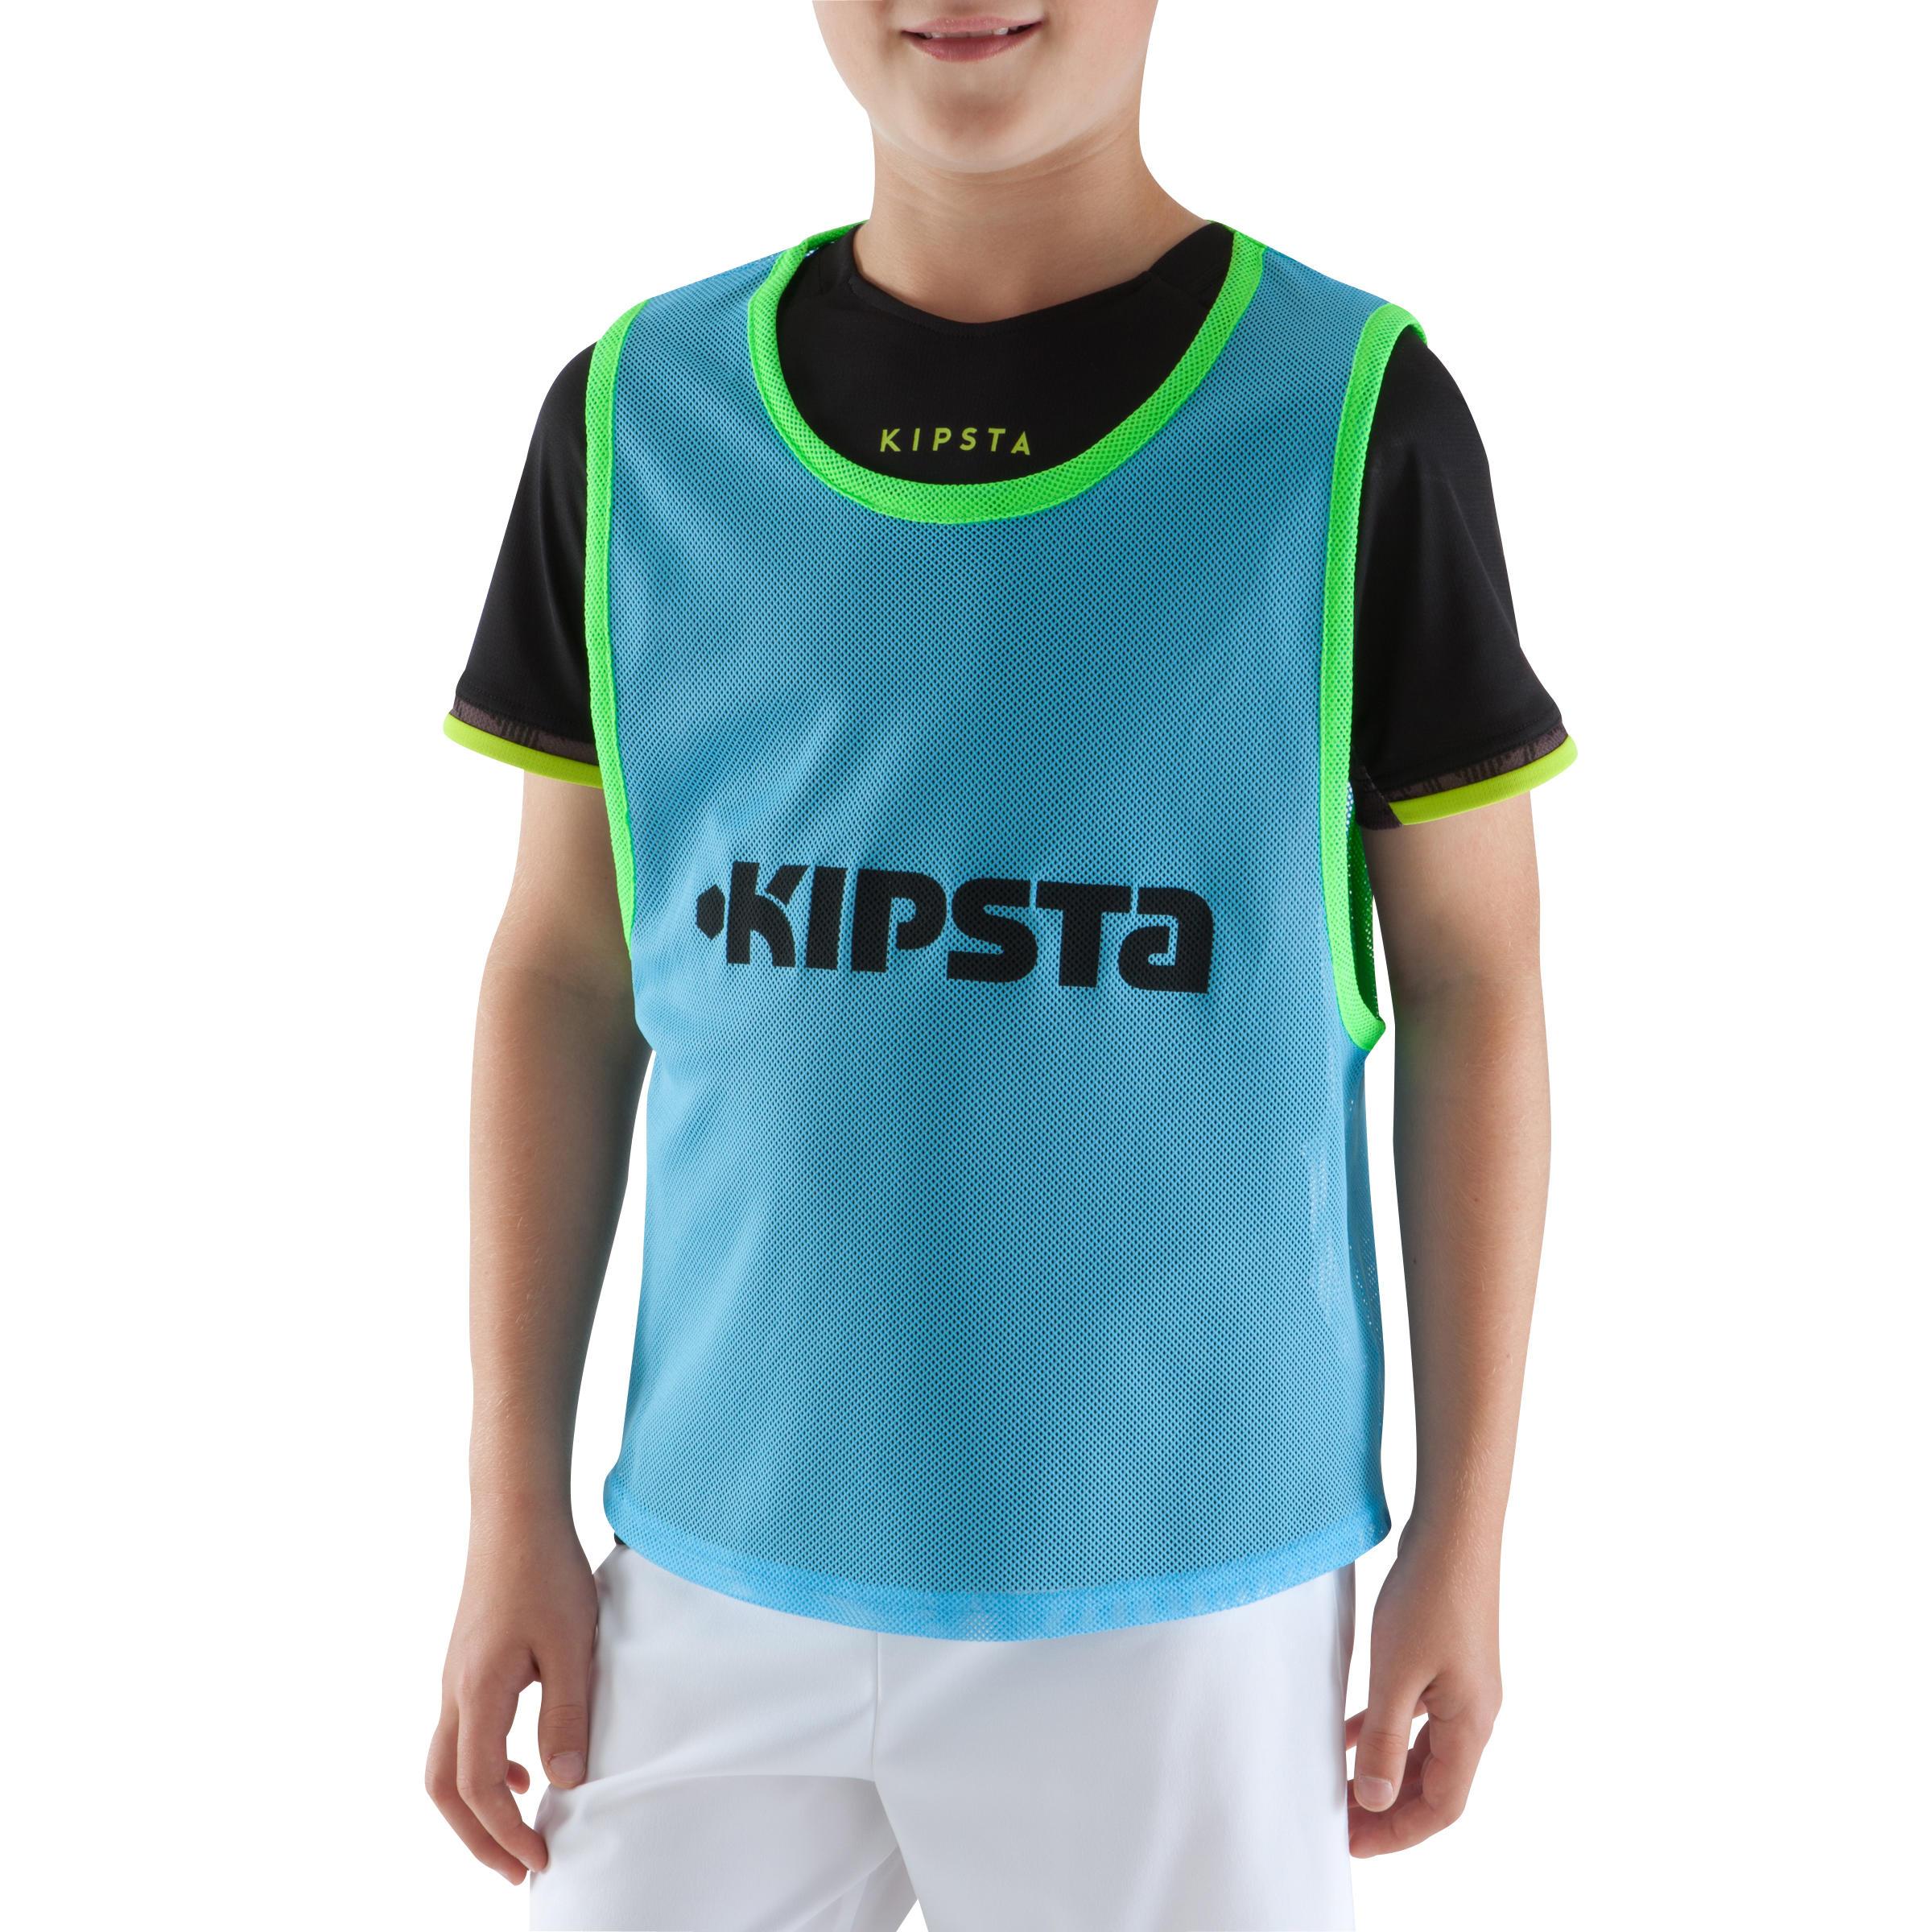 Dossard sports collectifs enfant bleu